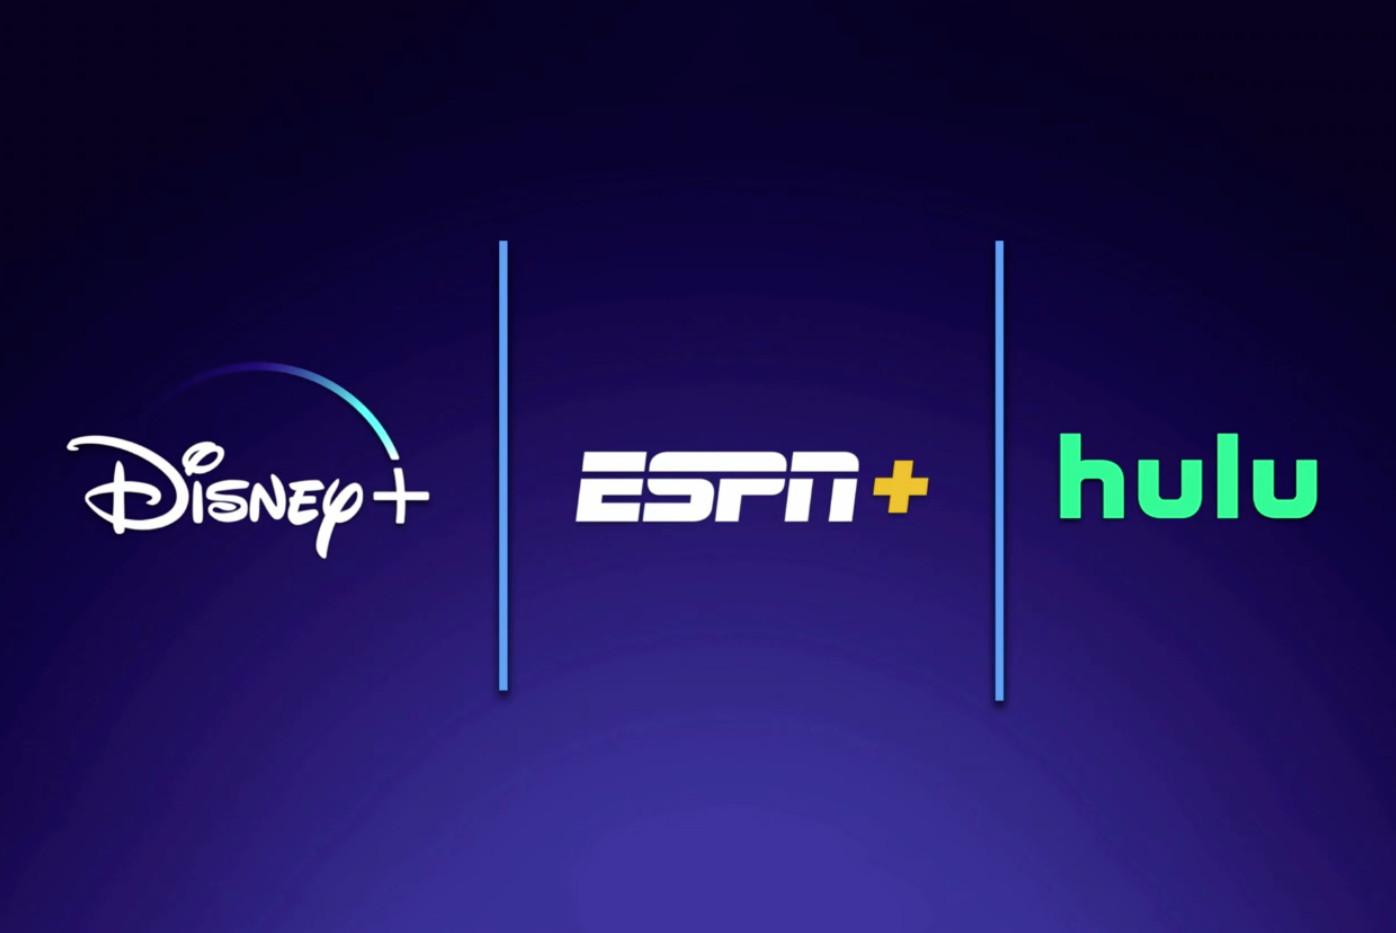 Disney announces $12 99 bundle for Disney+, Hulu, and ESPN+ - The Verge